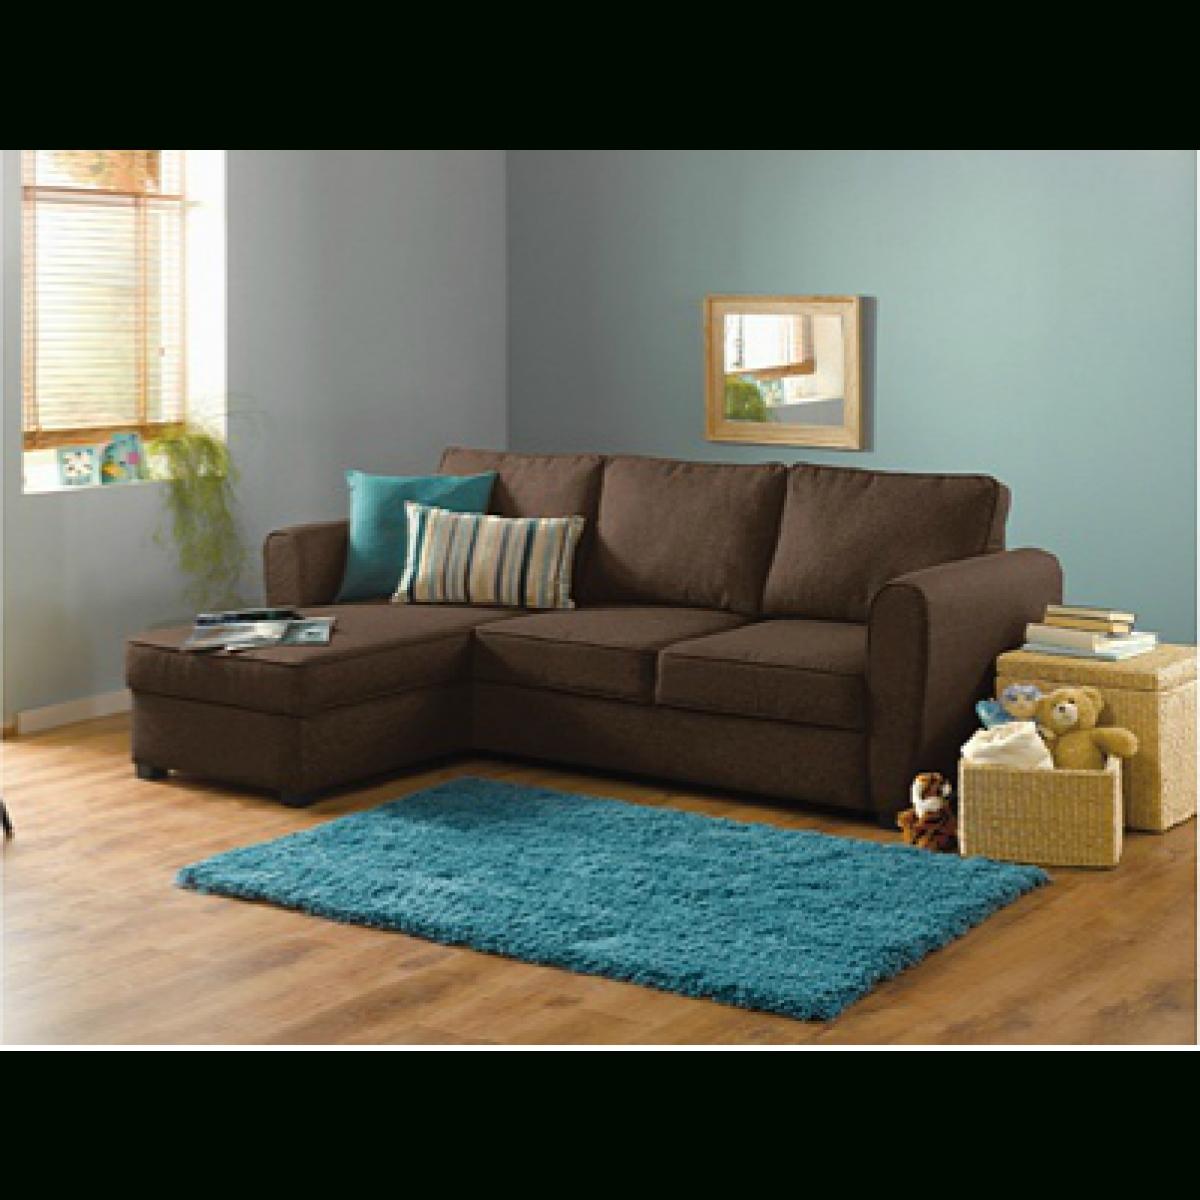 Well Known Home New Siena Fabric Corner Sofa Bed W/ Storage – Chocolate Regarding Fabric Corner Sofas (View 6 of 15)